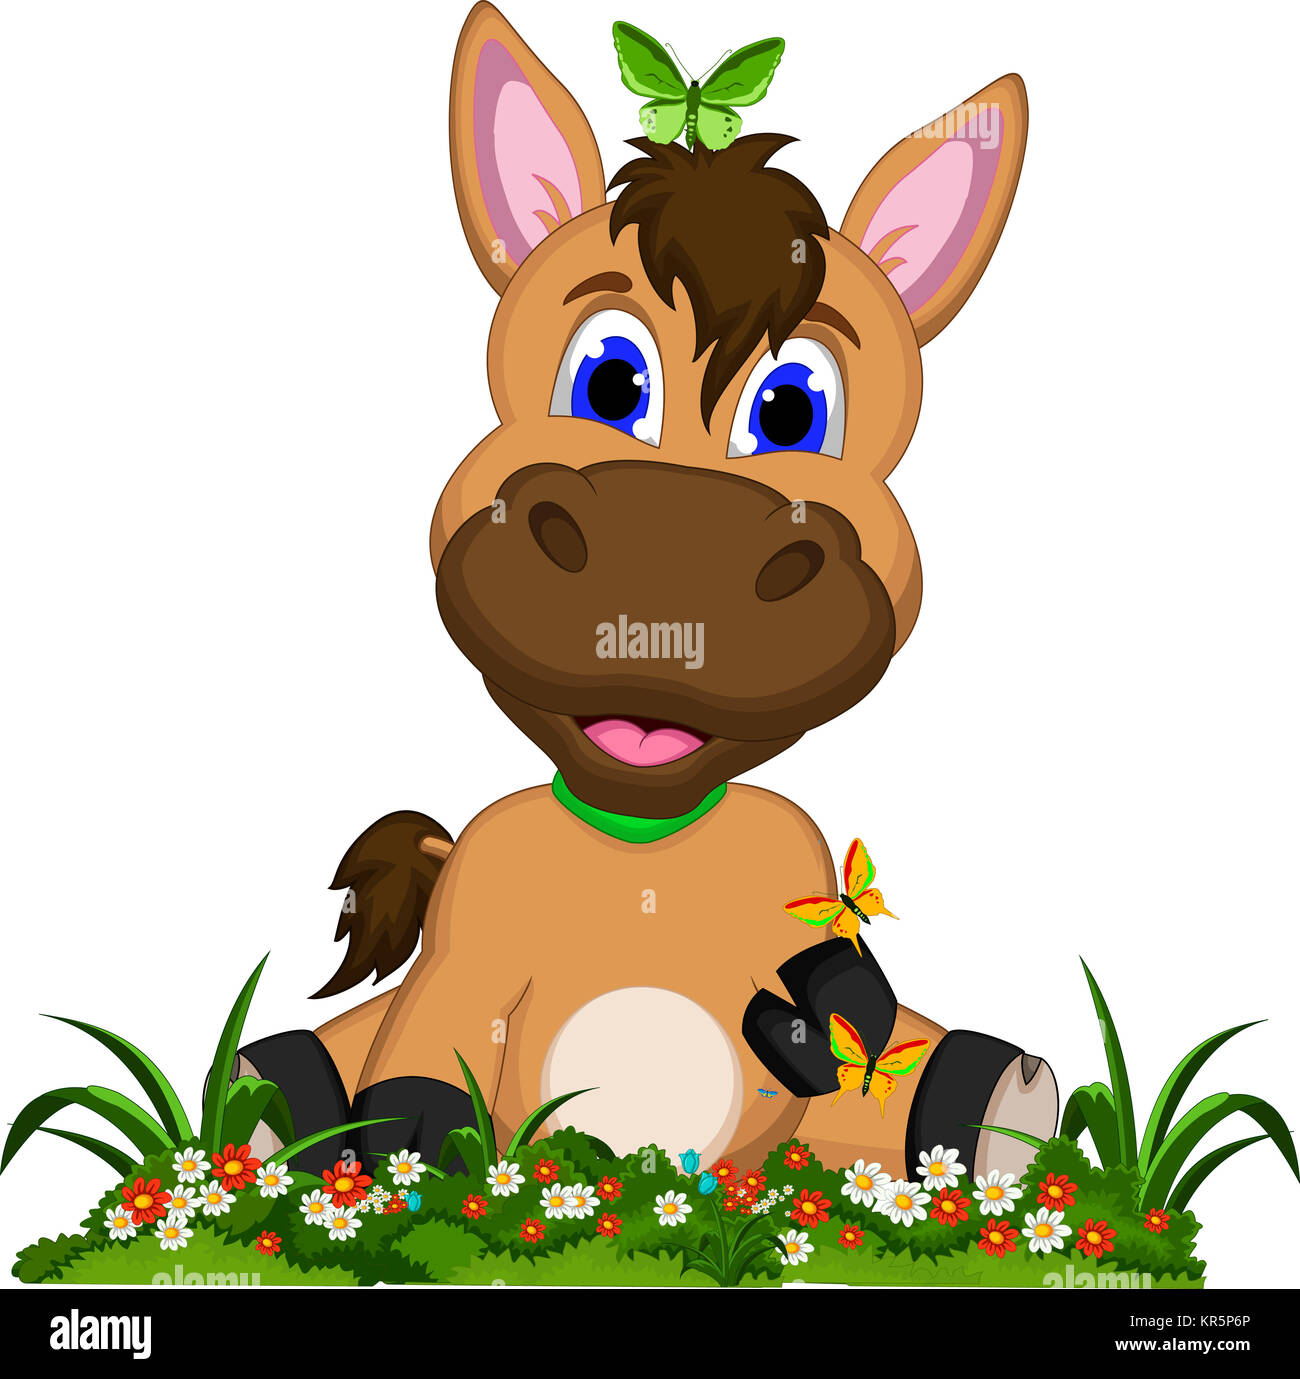 Funny Horse Cartoon With Flower Garden Stock Photo Alamy